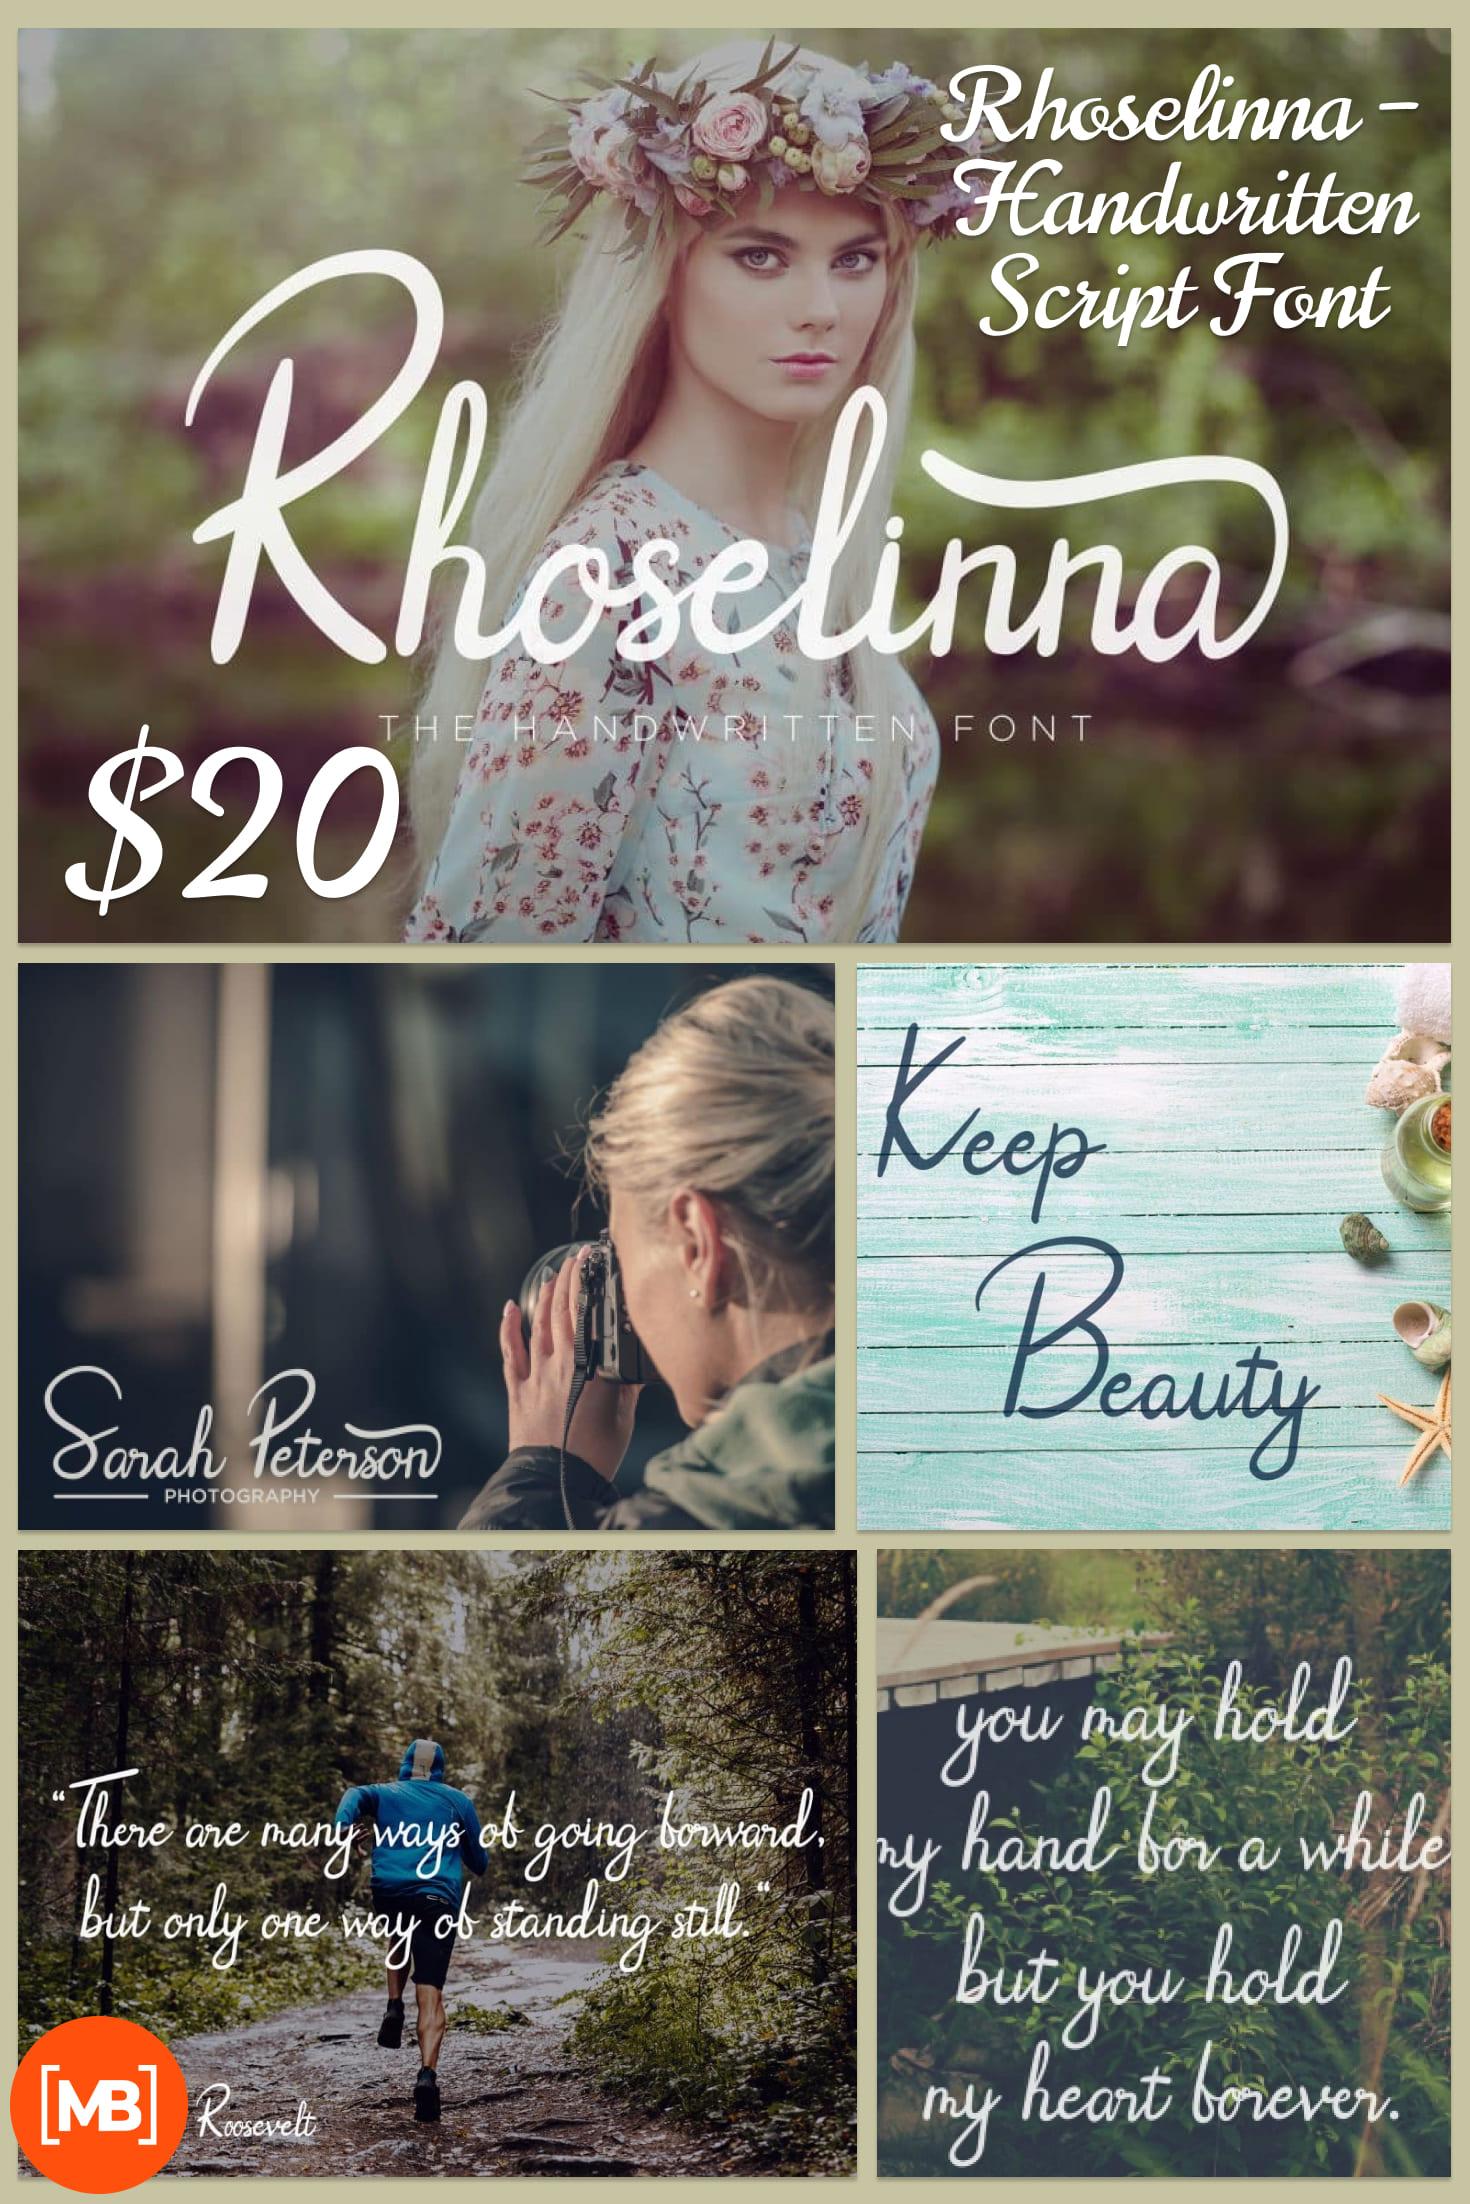 Pinterest Image: Rhoselinna - Handwritten Script Font - $3.